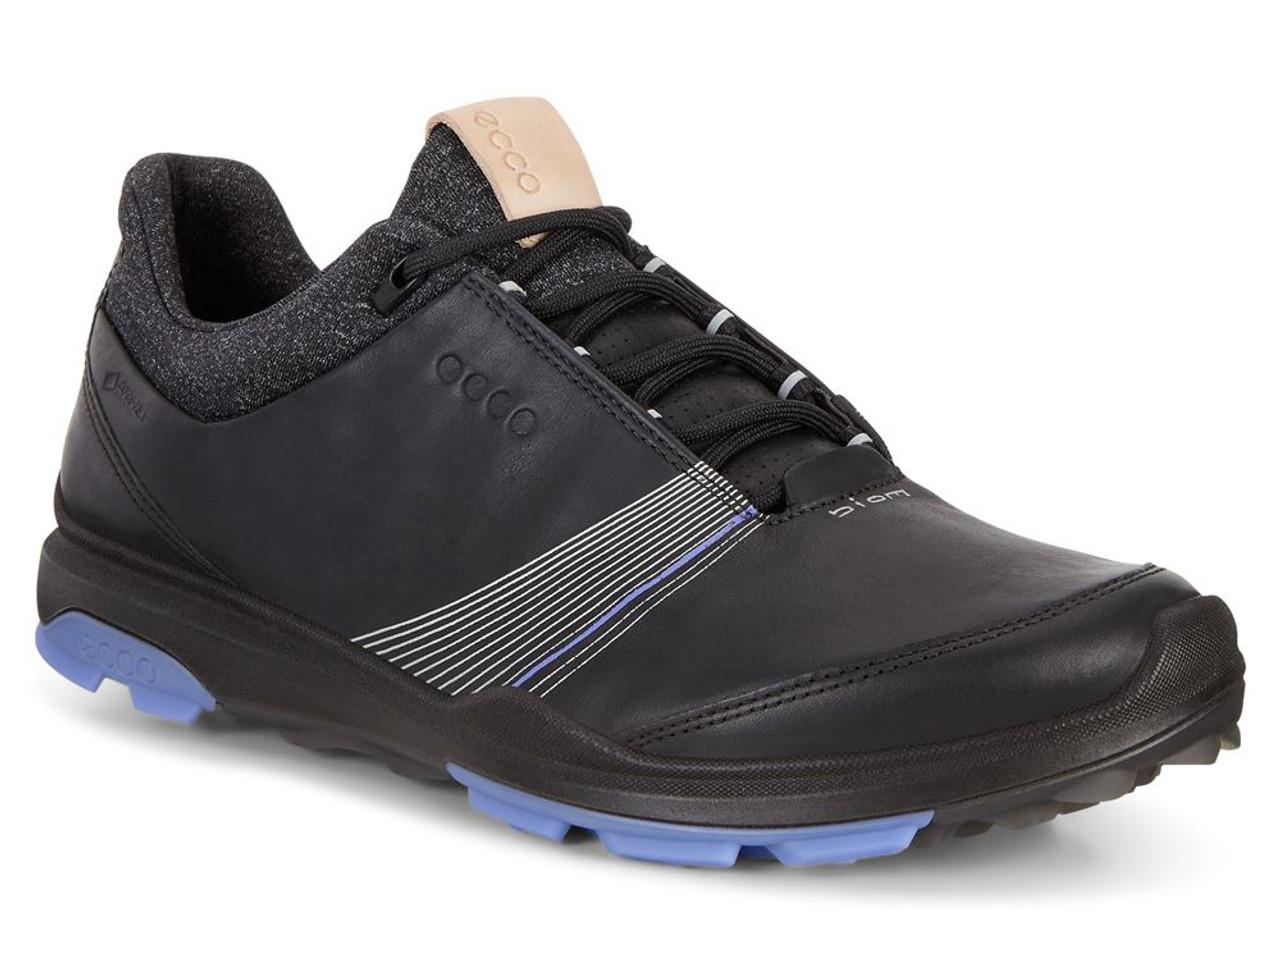 9a2e1880b2 Ecco W Biom Golf Club Hybrid 3 Golf Shoes - Black - Ladies For Sale ...